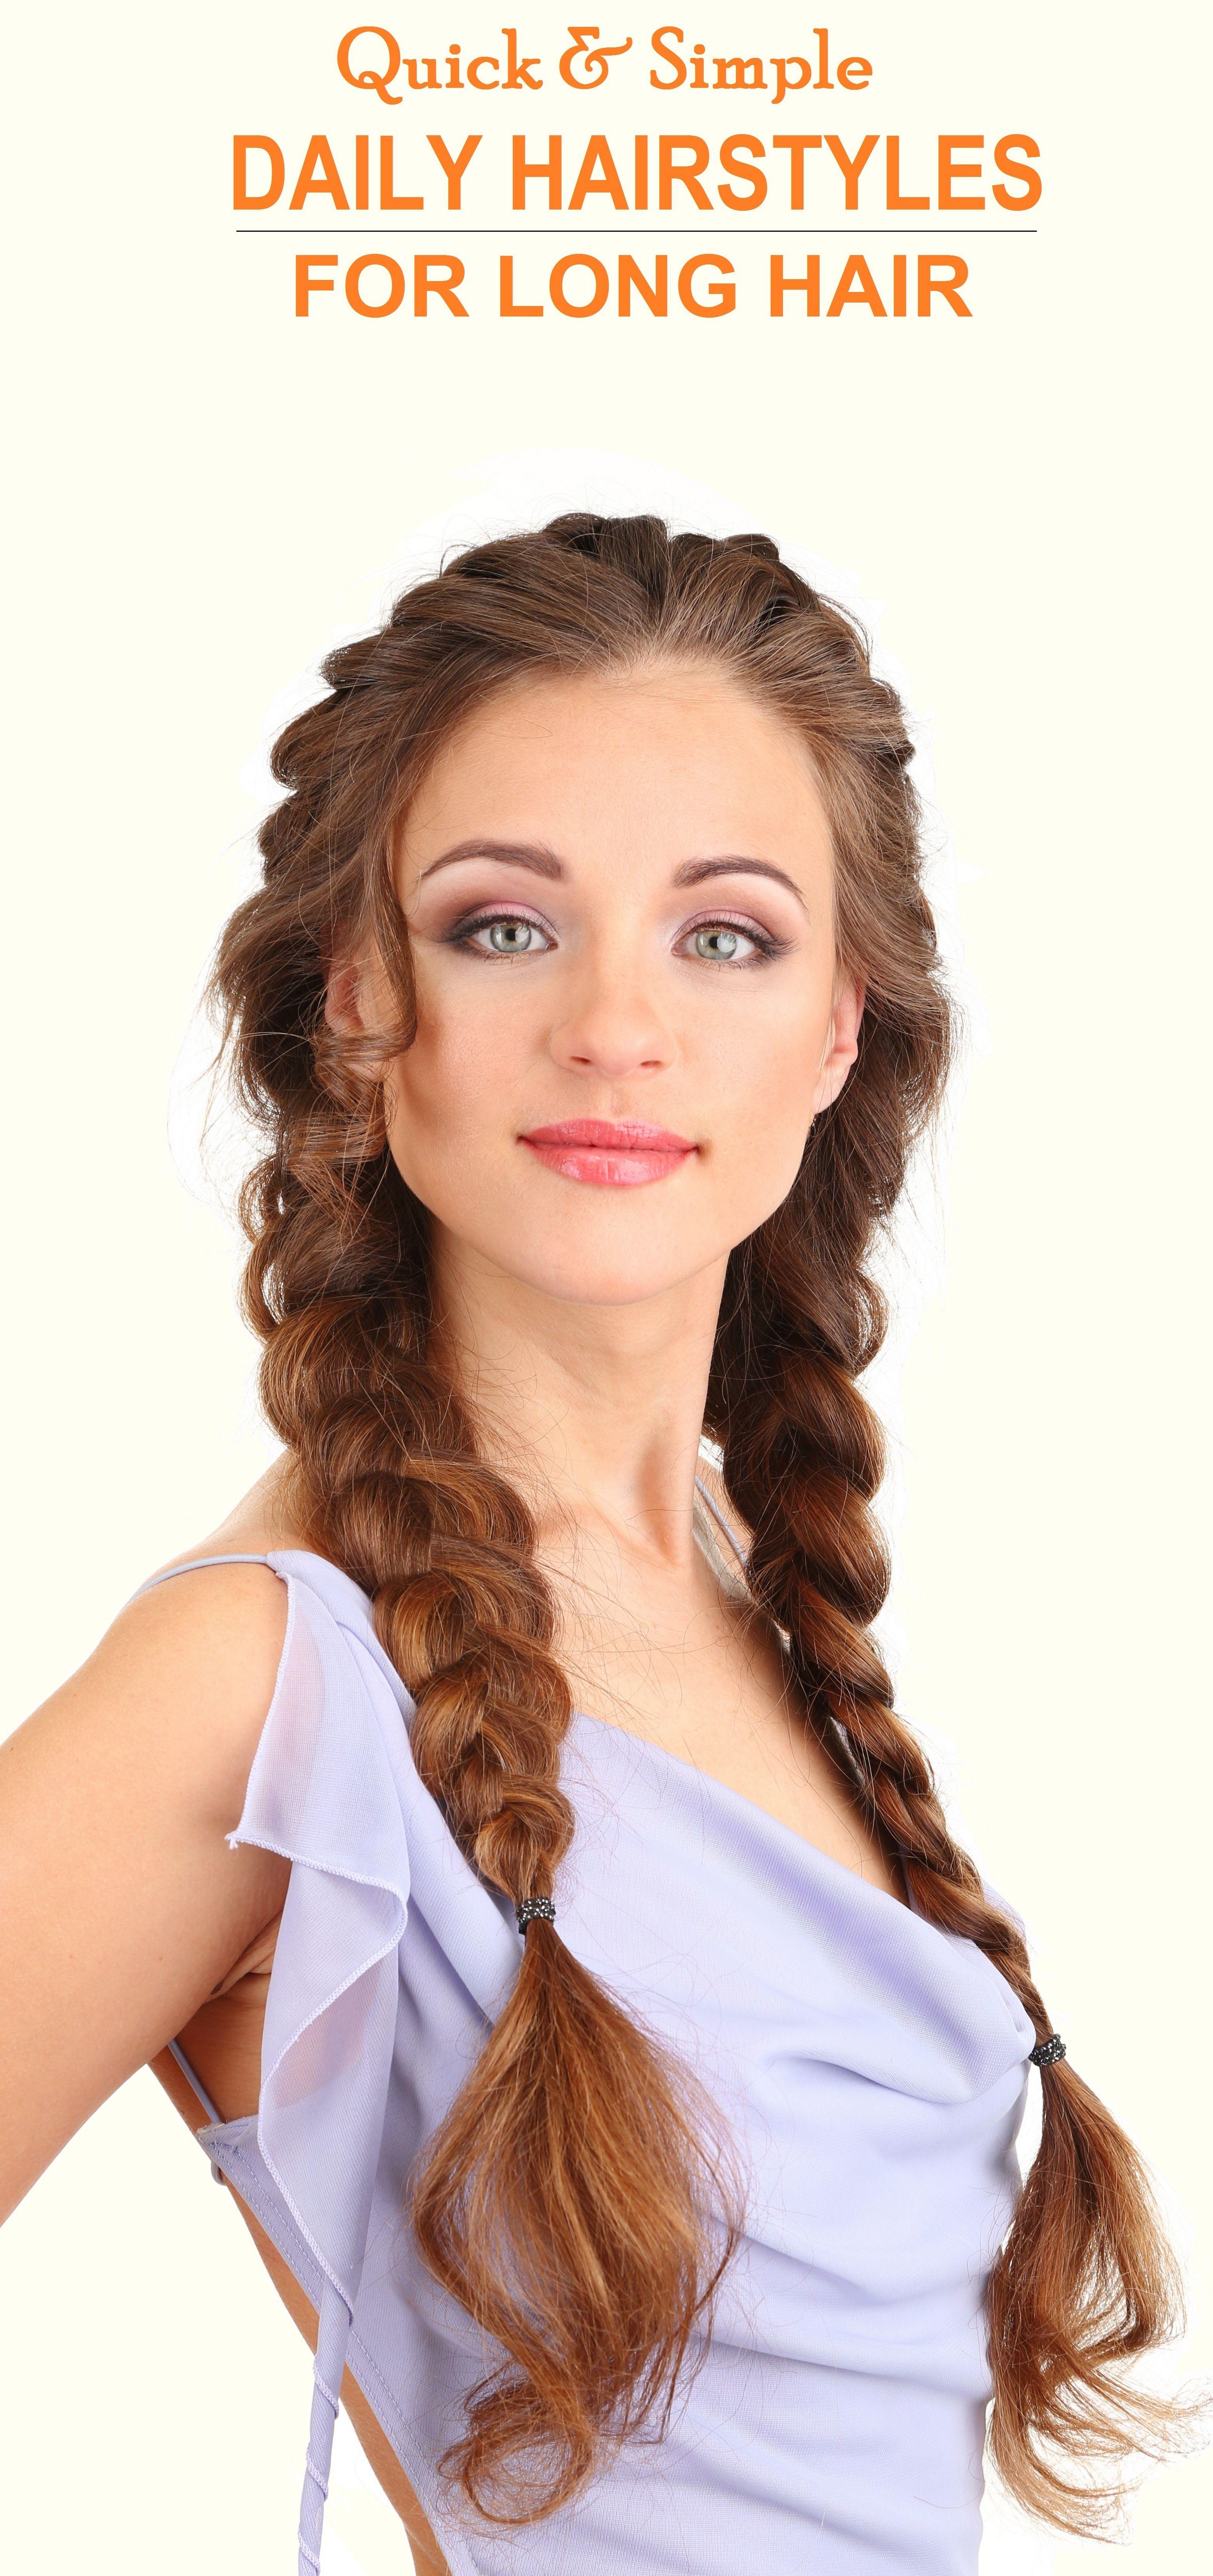 100 Cute Easy Summer Hairstyles For Long Hair Daily Hairstyles Summer Hairstyles Long Hair Styles